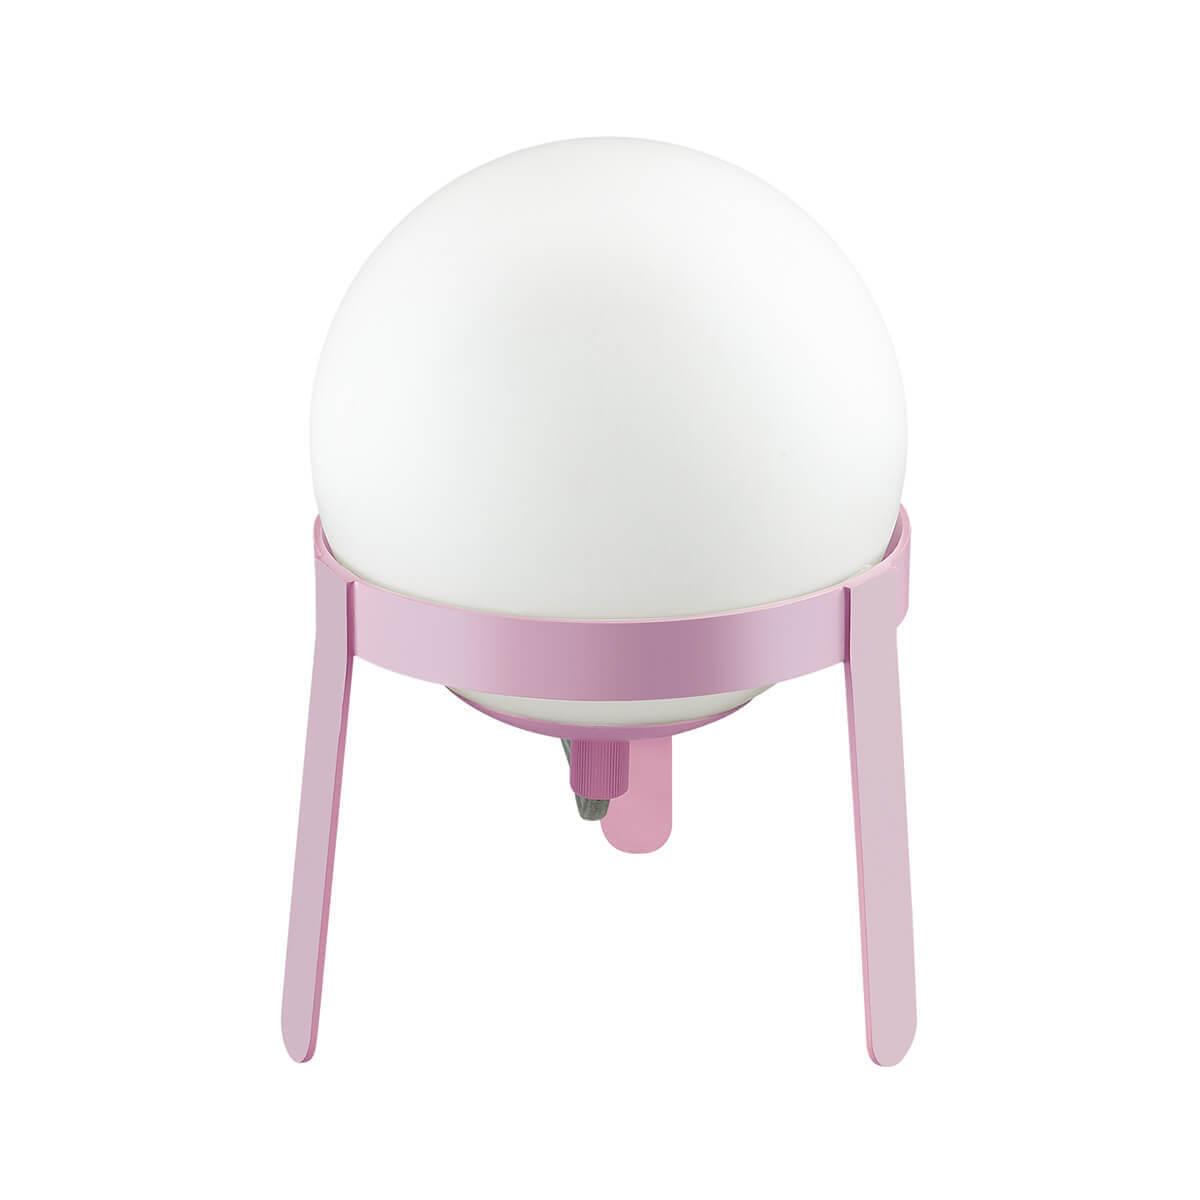 Настольная лампа Lumion Chipo 3649/1T настольная лампа декоративная lumion chipo 3650 1t